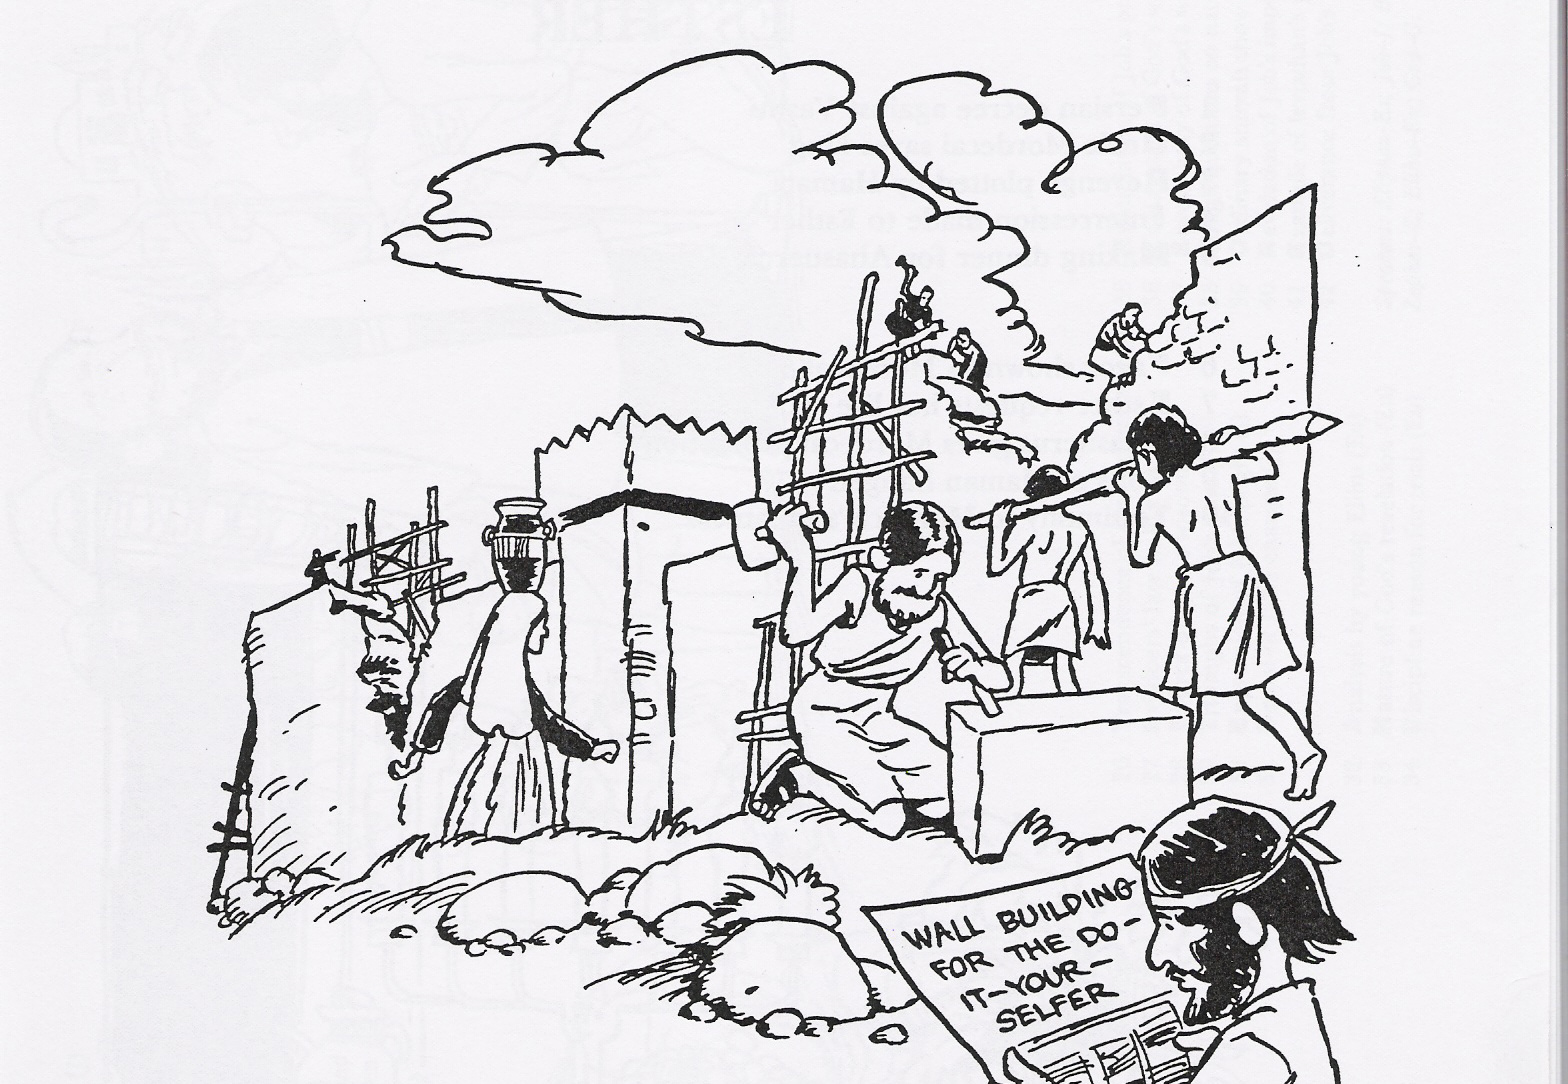 1568x1084 Acrostic Bible Spiritual Formation On The Run